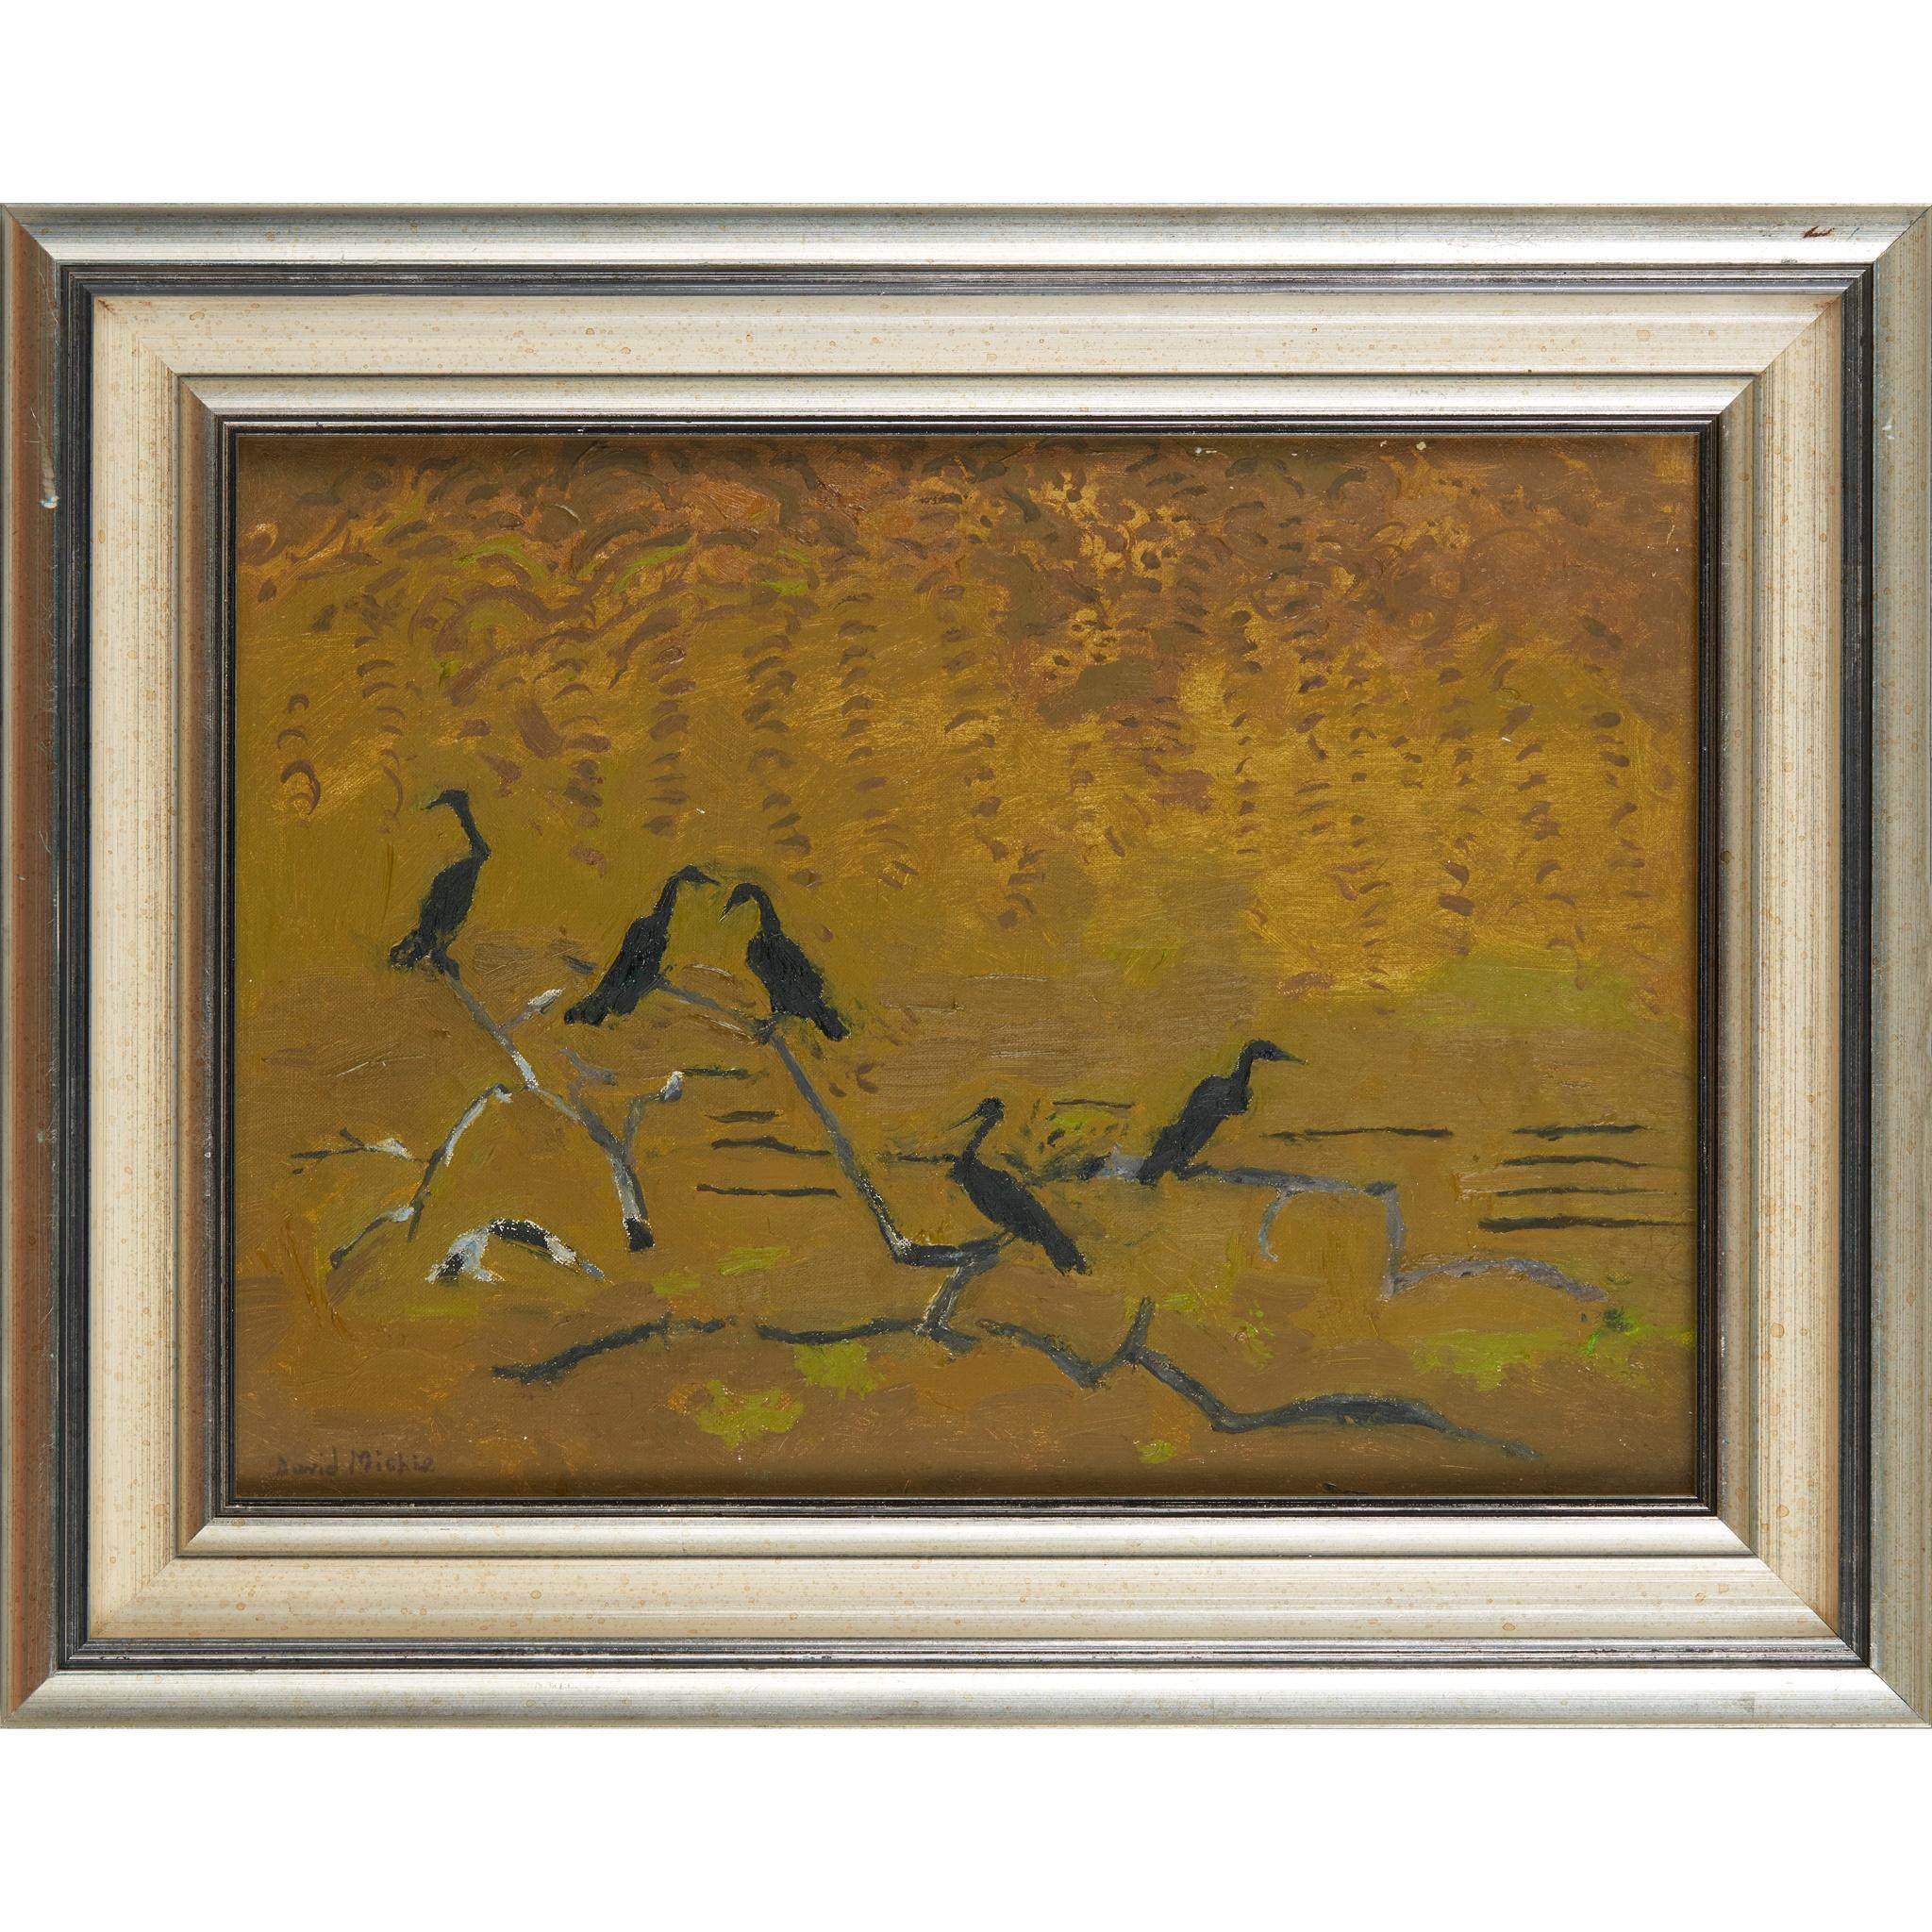 § DAVID MICHIE O.B.E., R.S.A., R.G.I., F.R.S.A (SCOTTISH 1928-2015) CORMORANTS IN THE LAGOON, SANTA - Image 2 of 3